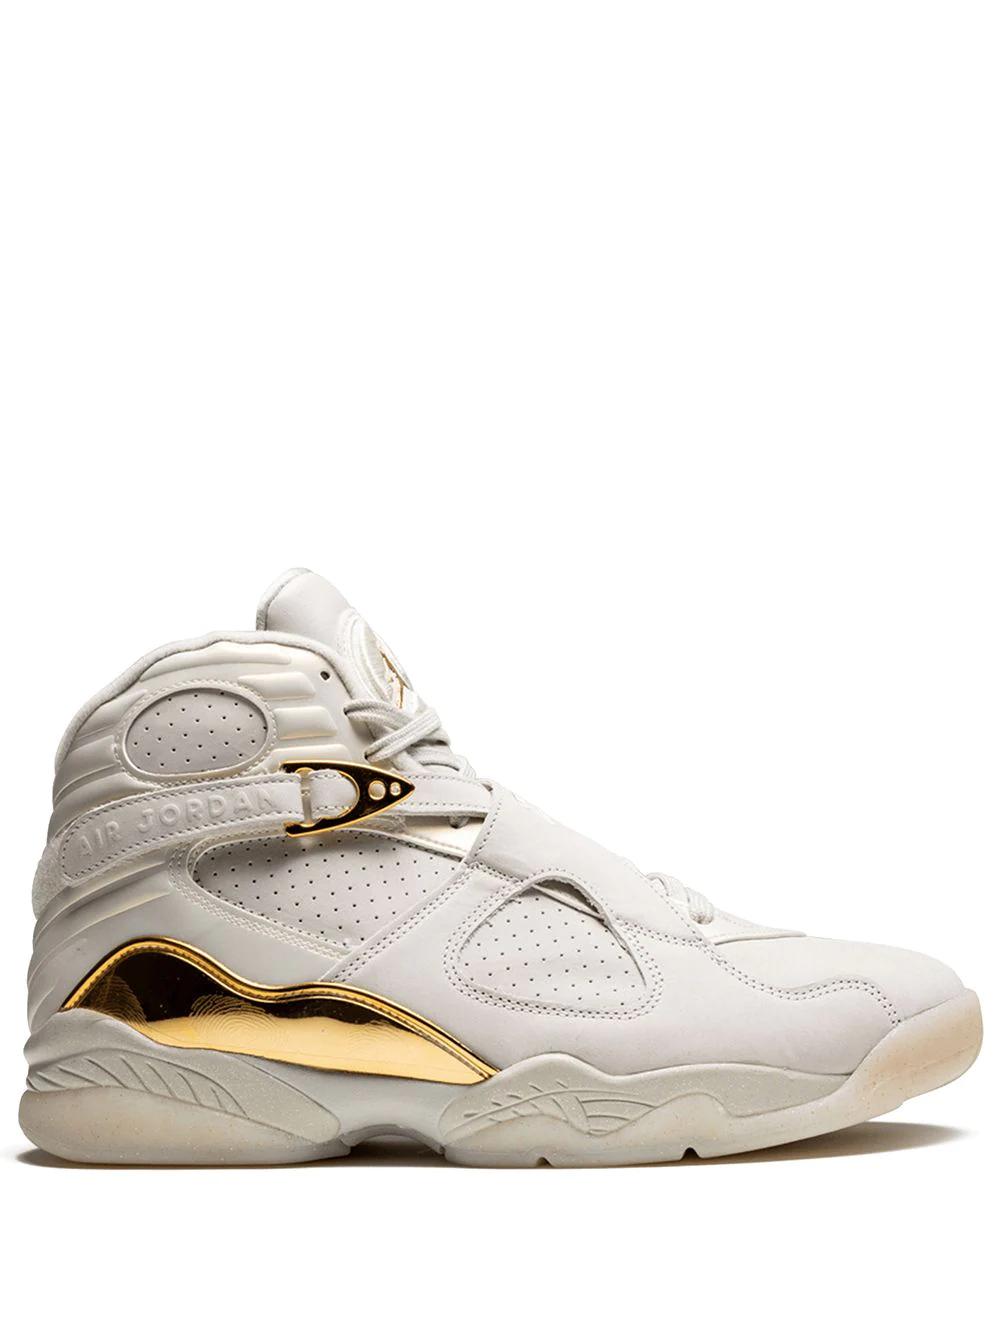 Jordan | Jordan кроссовки Air Jordan 8 Retro C&C | Clouty